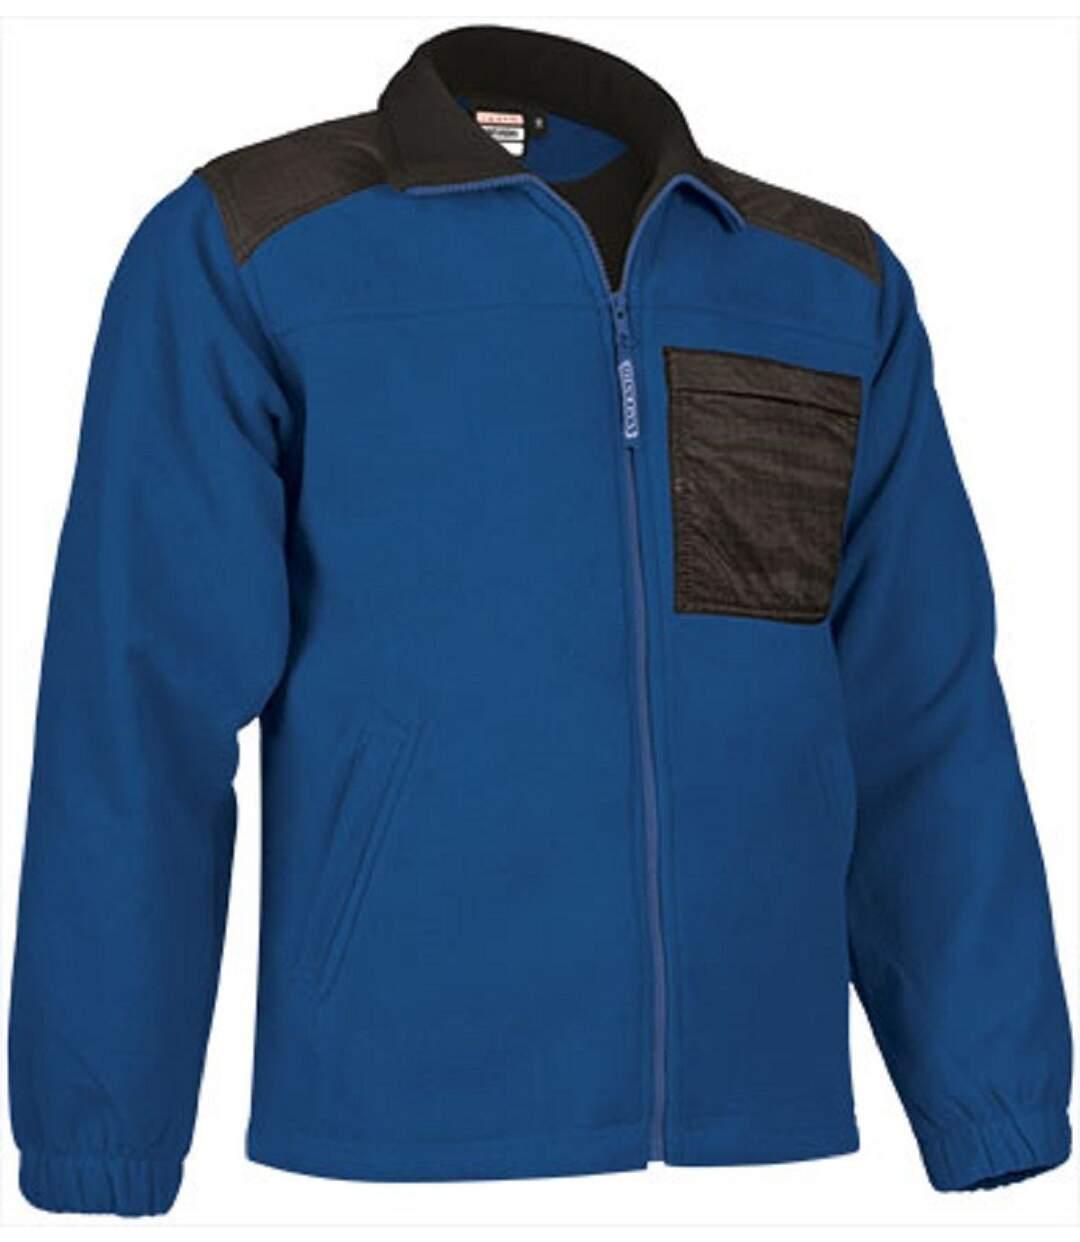 Veste polaire zippée - Homme - REF NEVADA - bleu roi